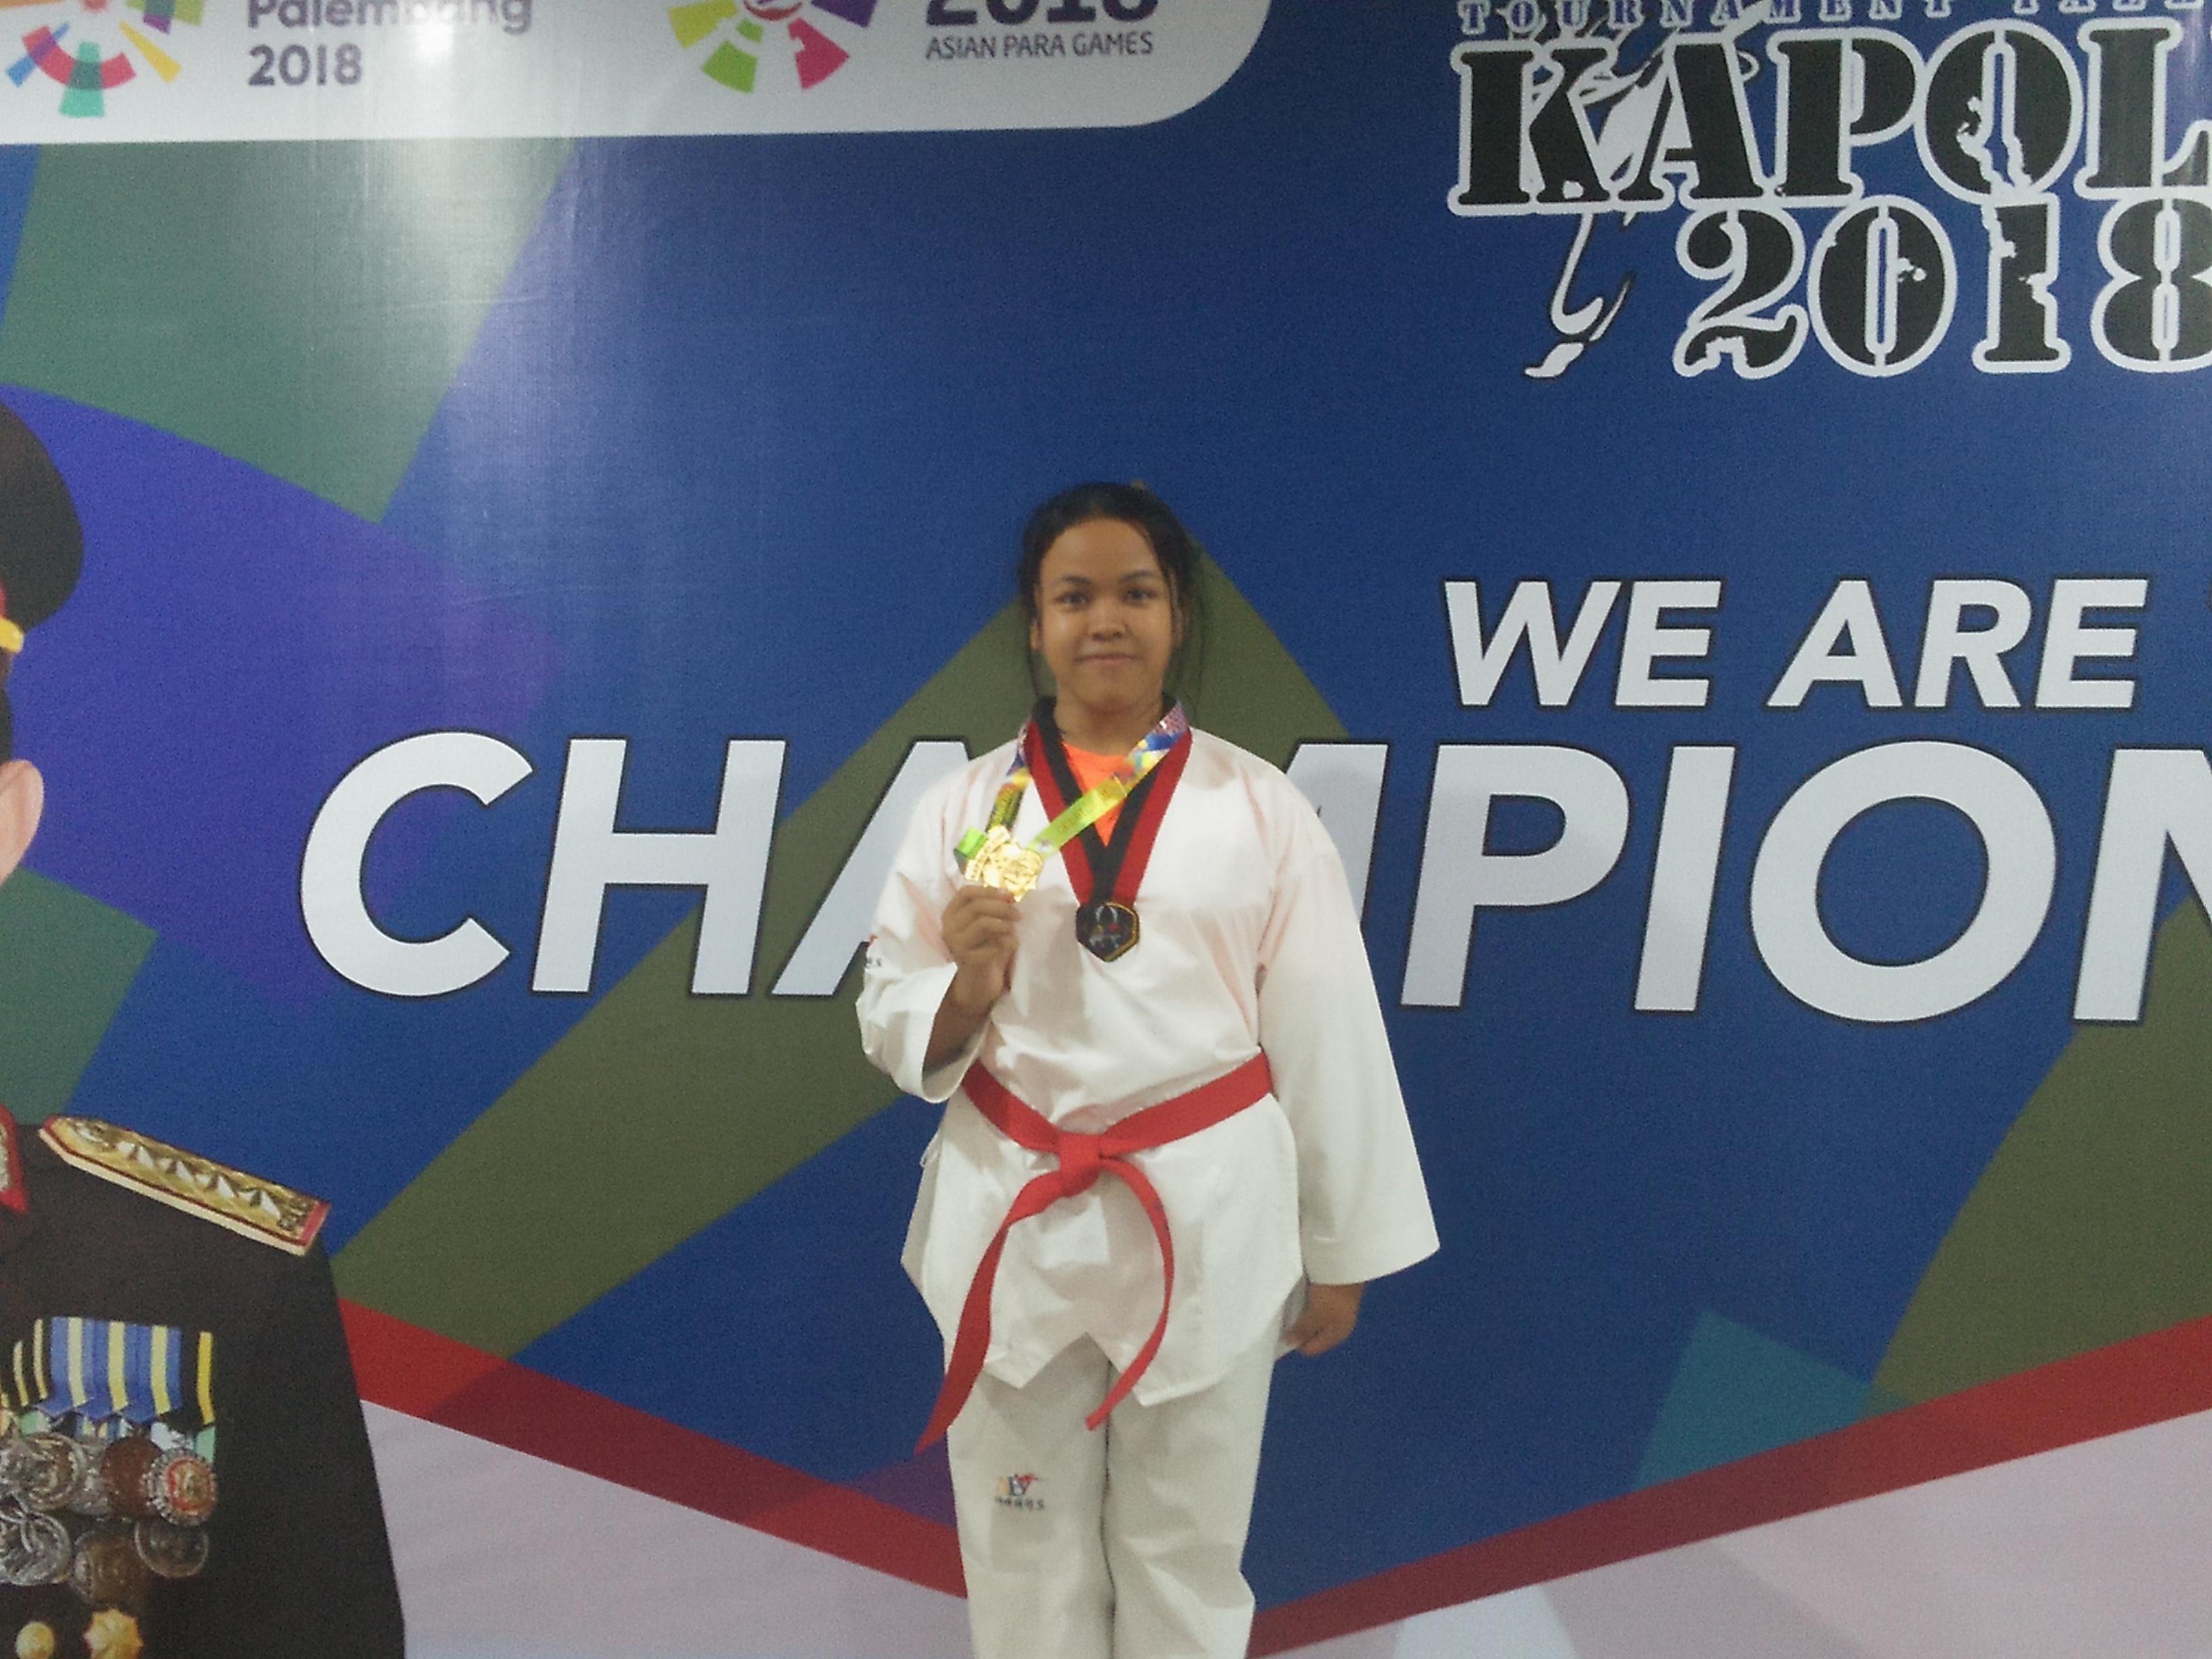 Medali Emas Taekwondo Kapolri Cup Se Indonesia